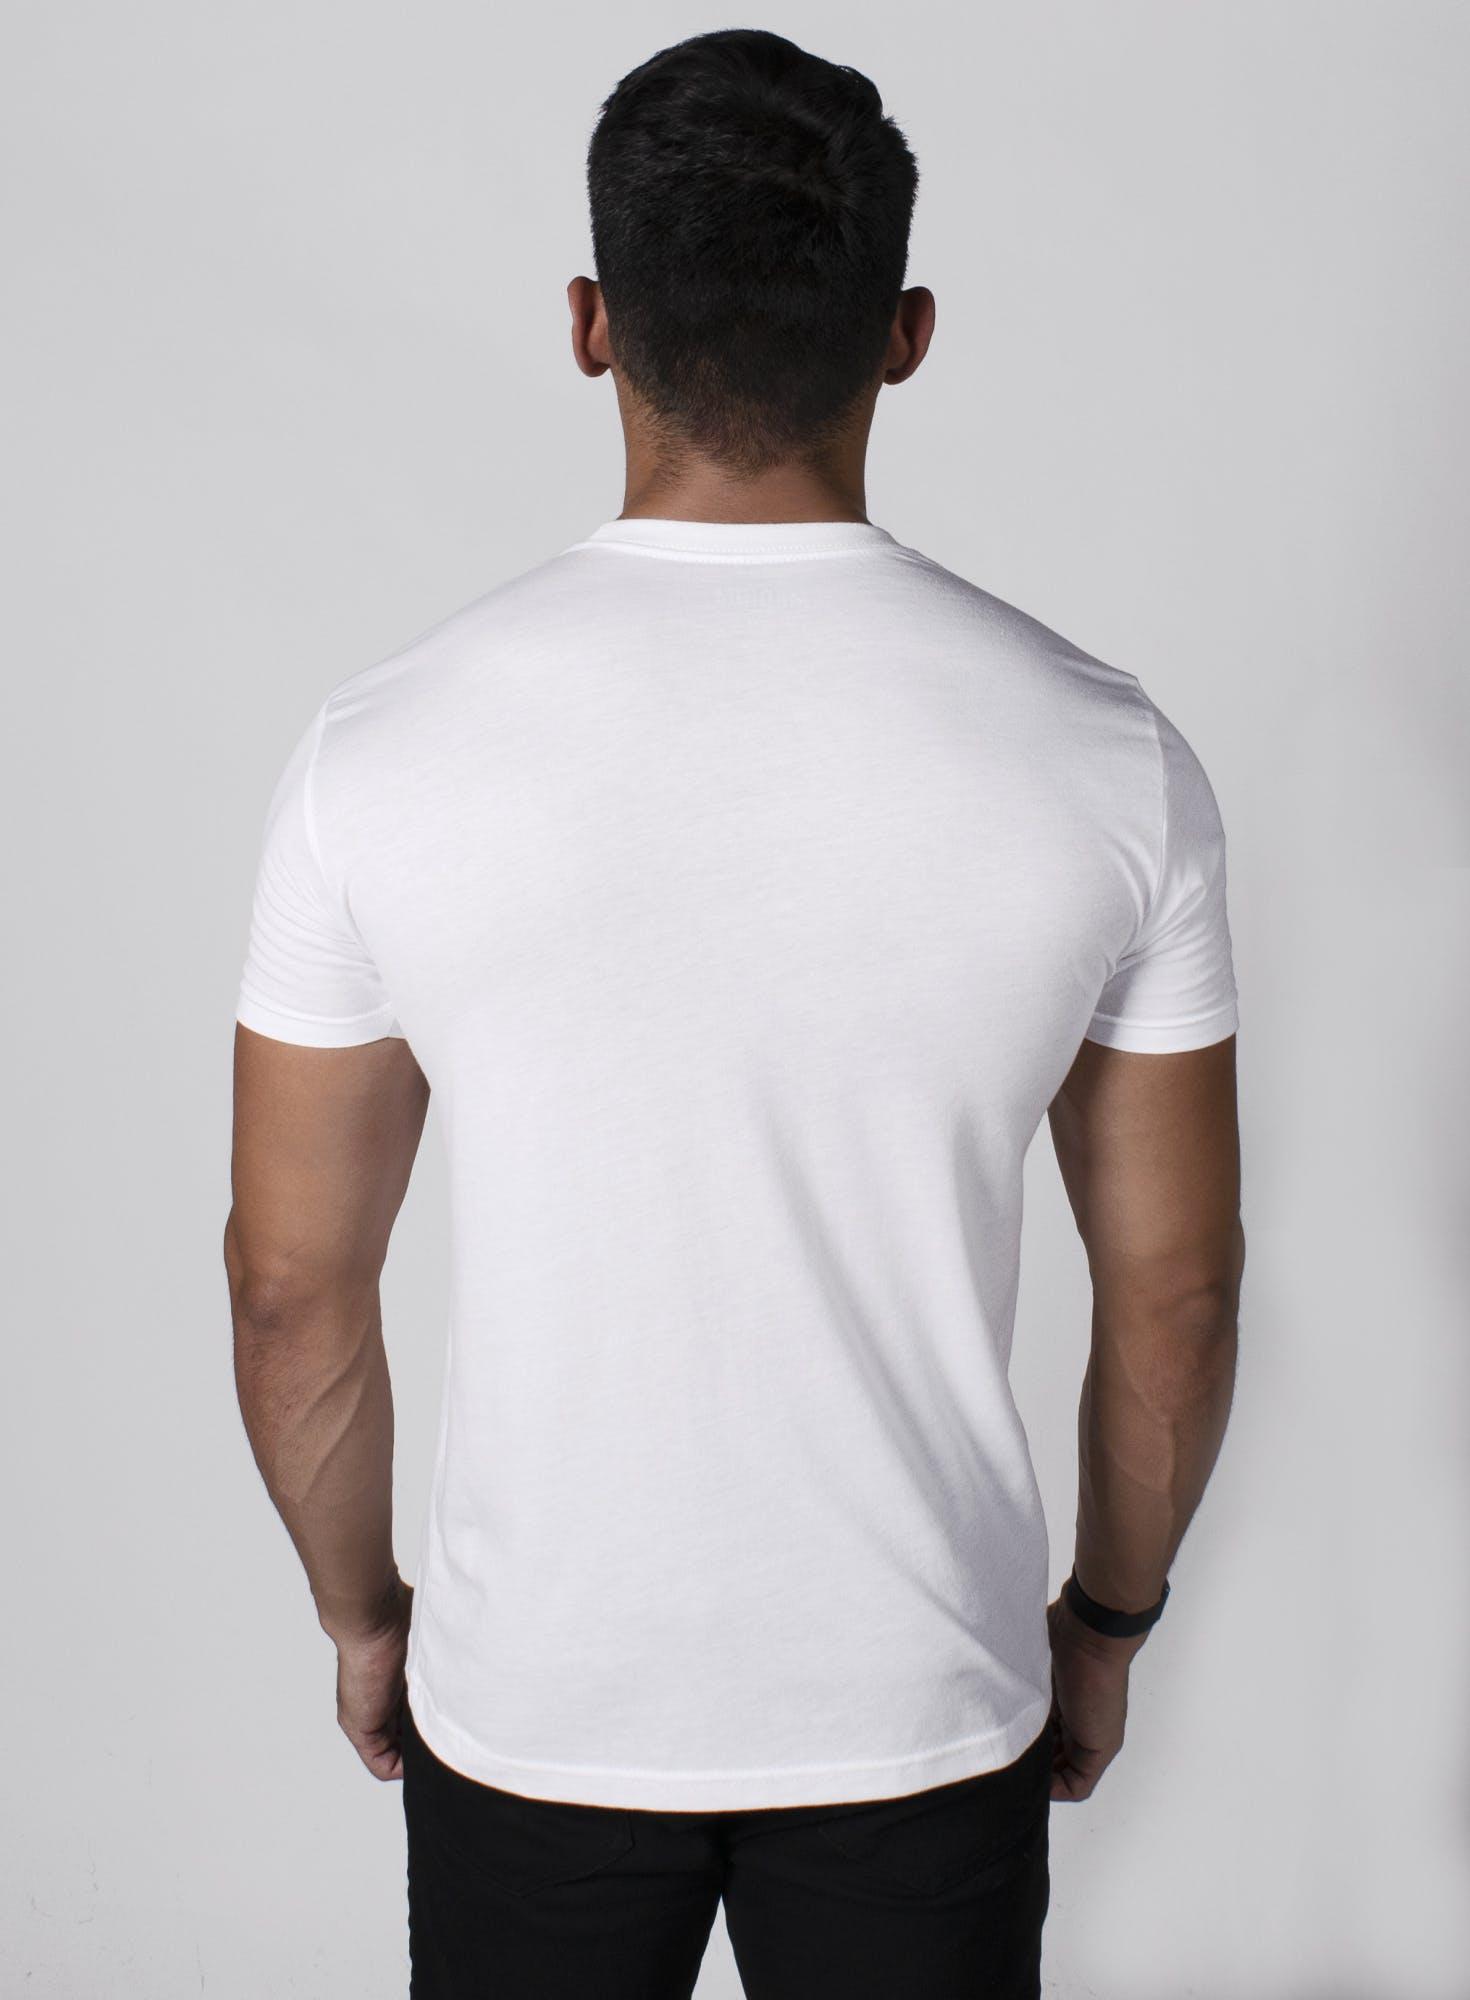 Blocked Tie Dye T-Shirt Bonus Image